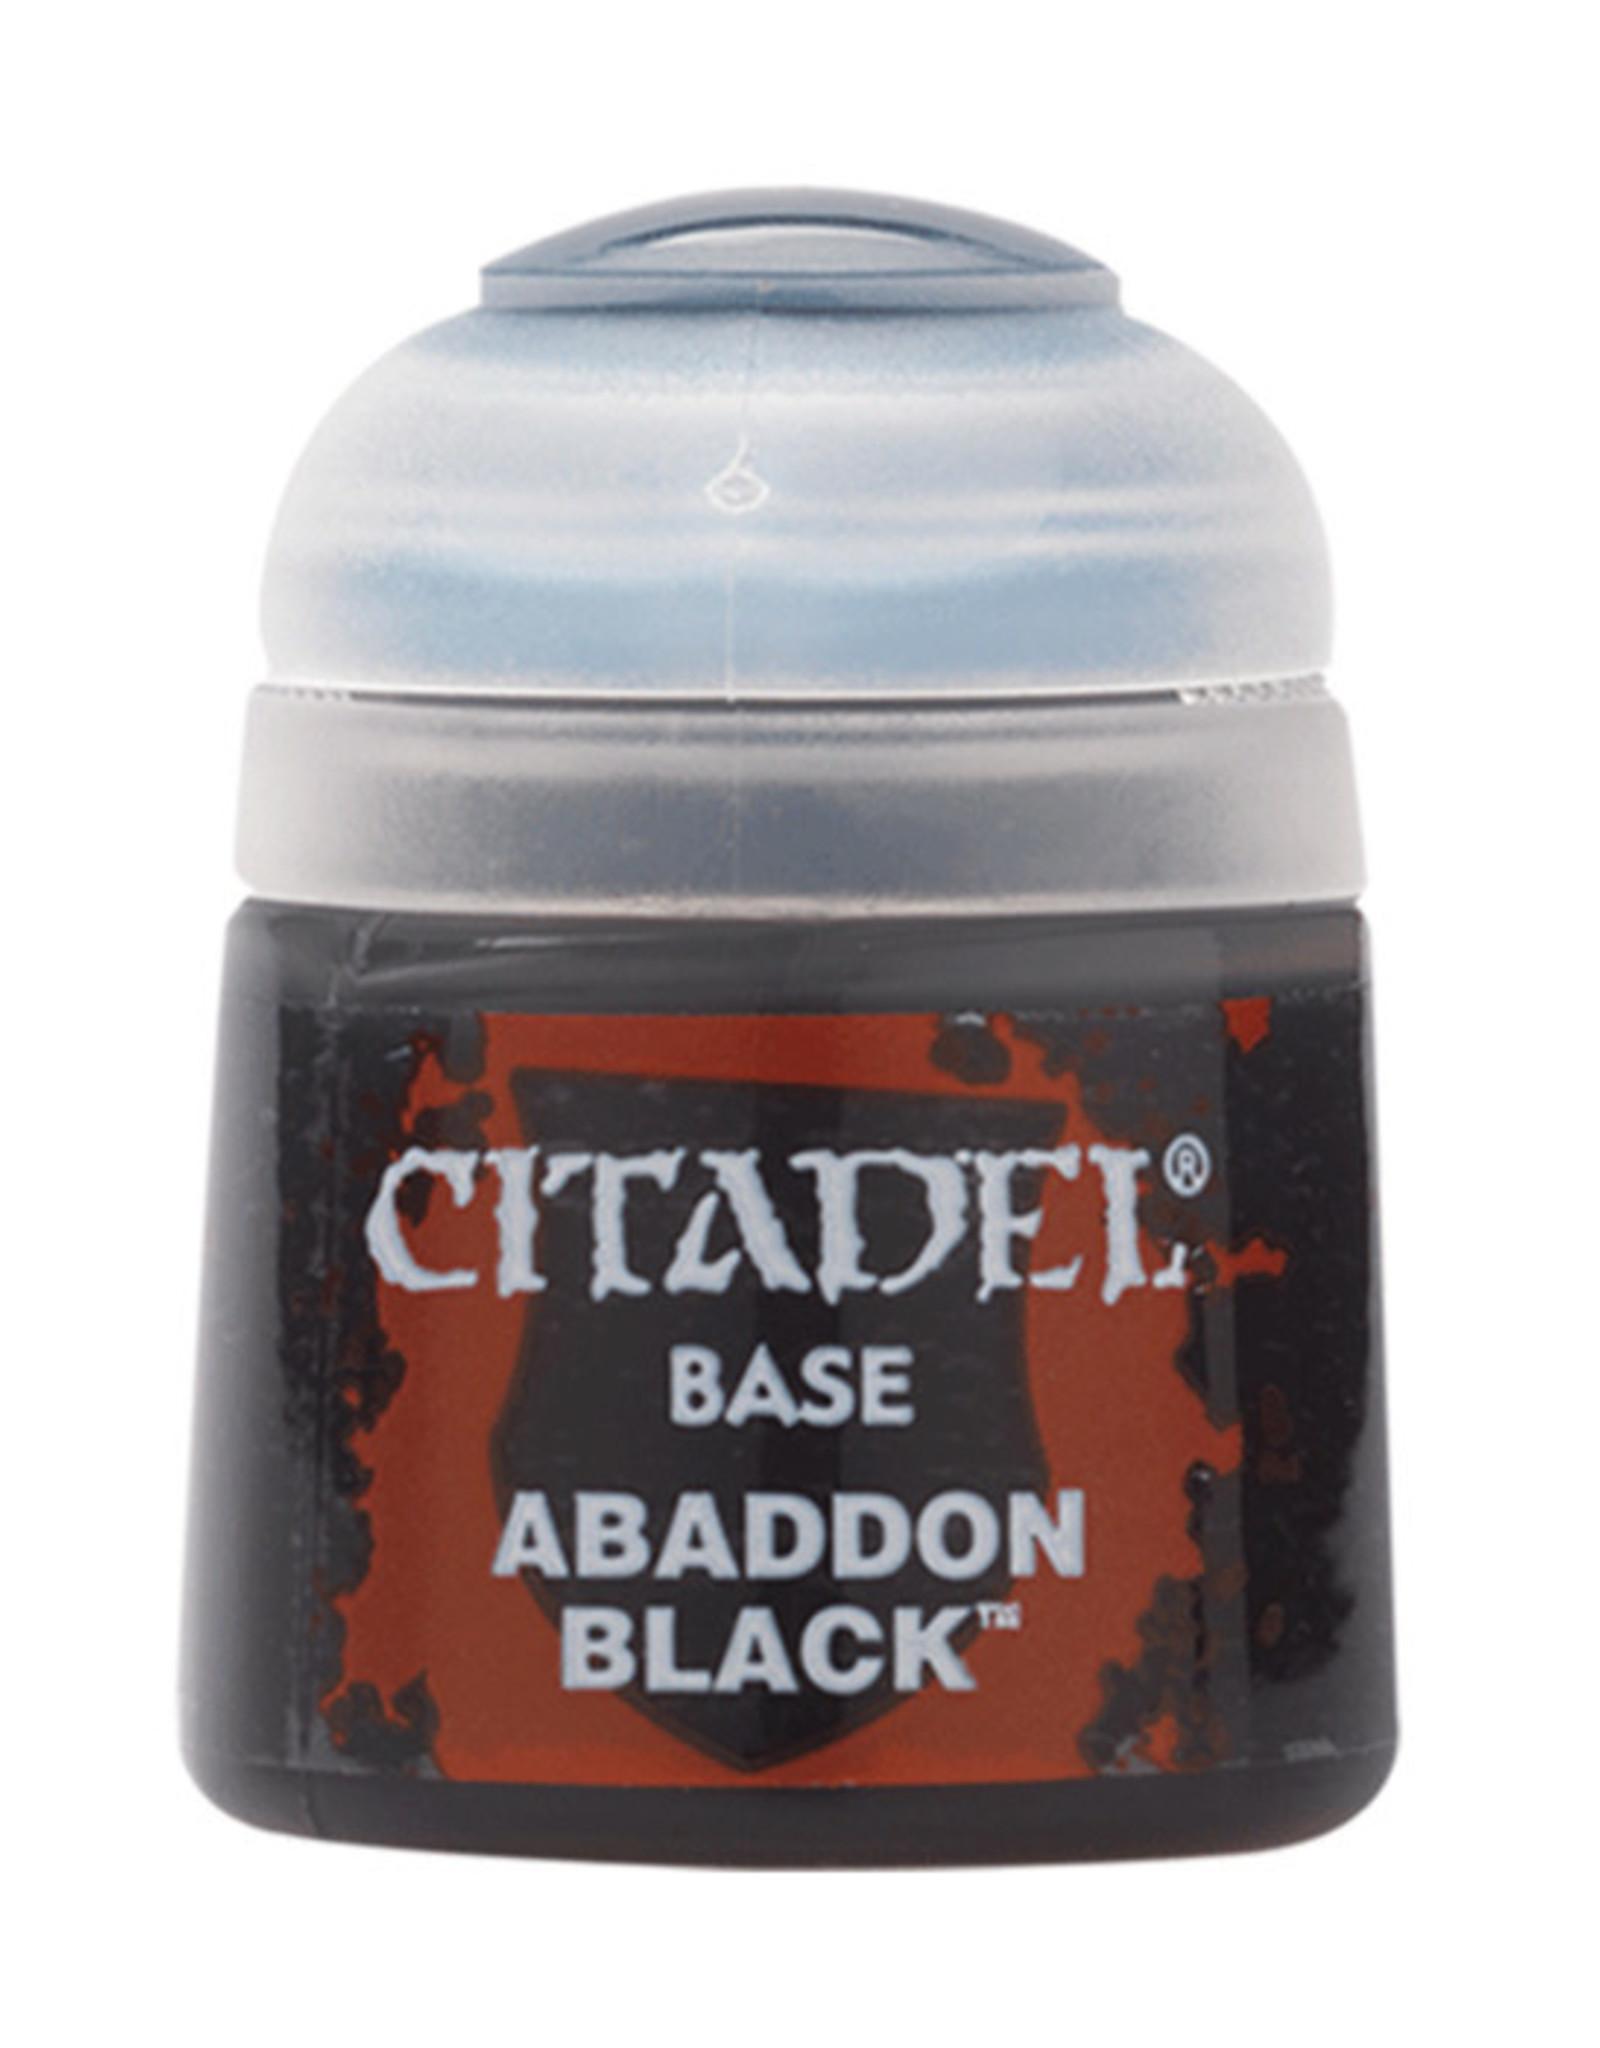 Citadel Citadel Colour: Base - Abaddon Black